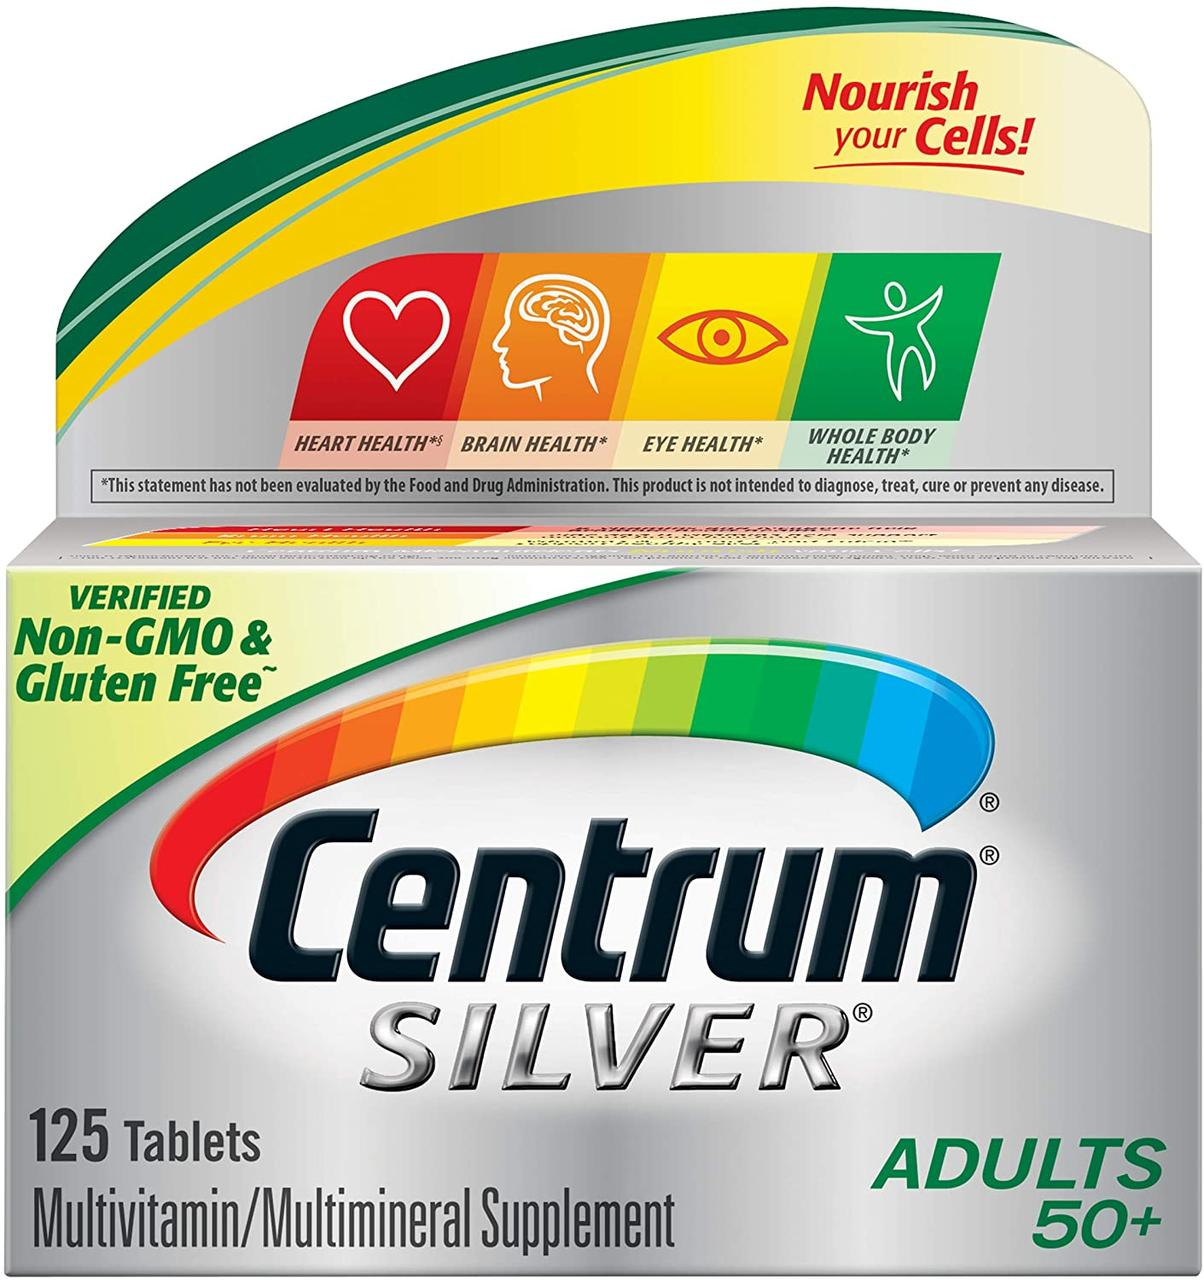 Мультивитамины Centrum Silver Adult (125 таблеток)  50+